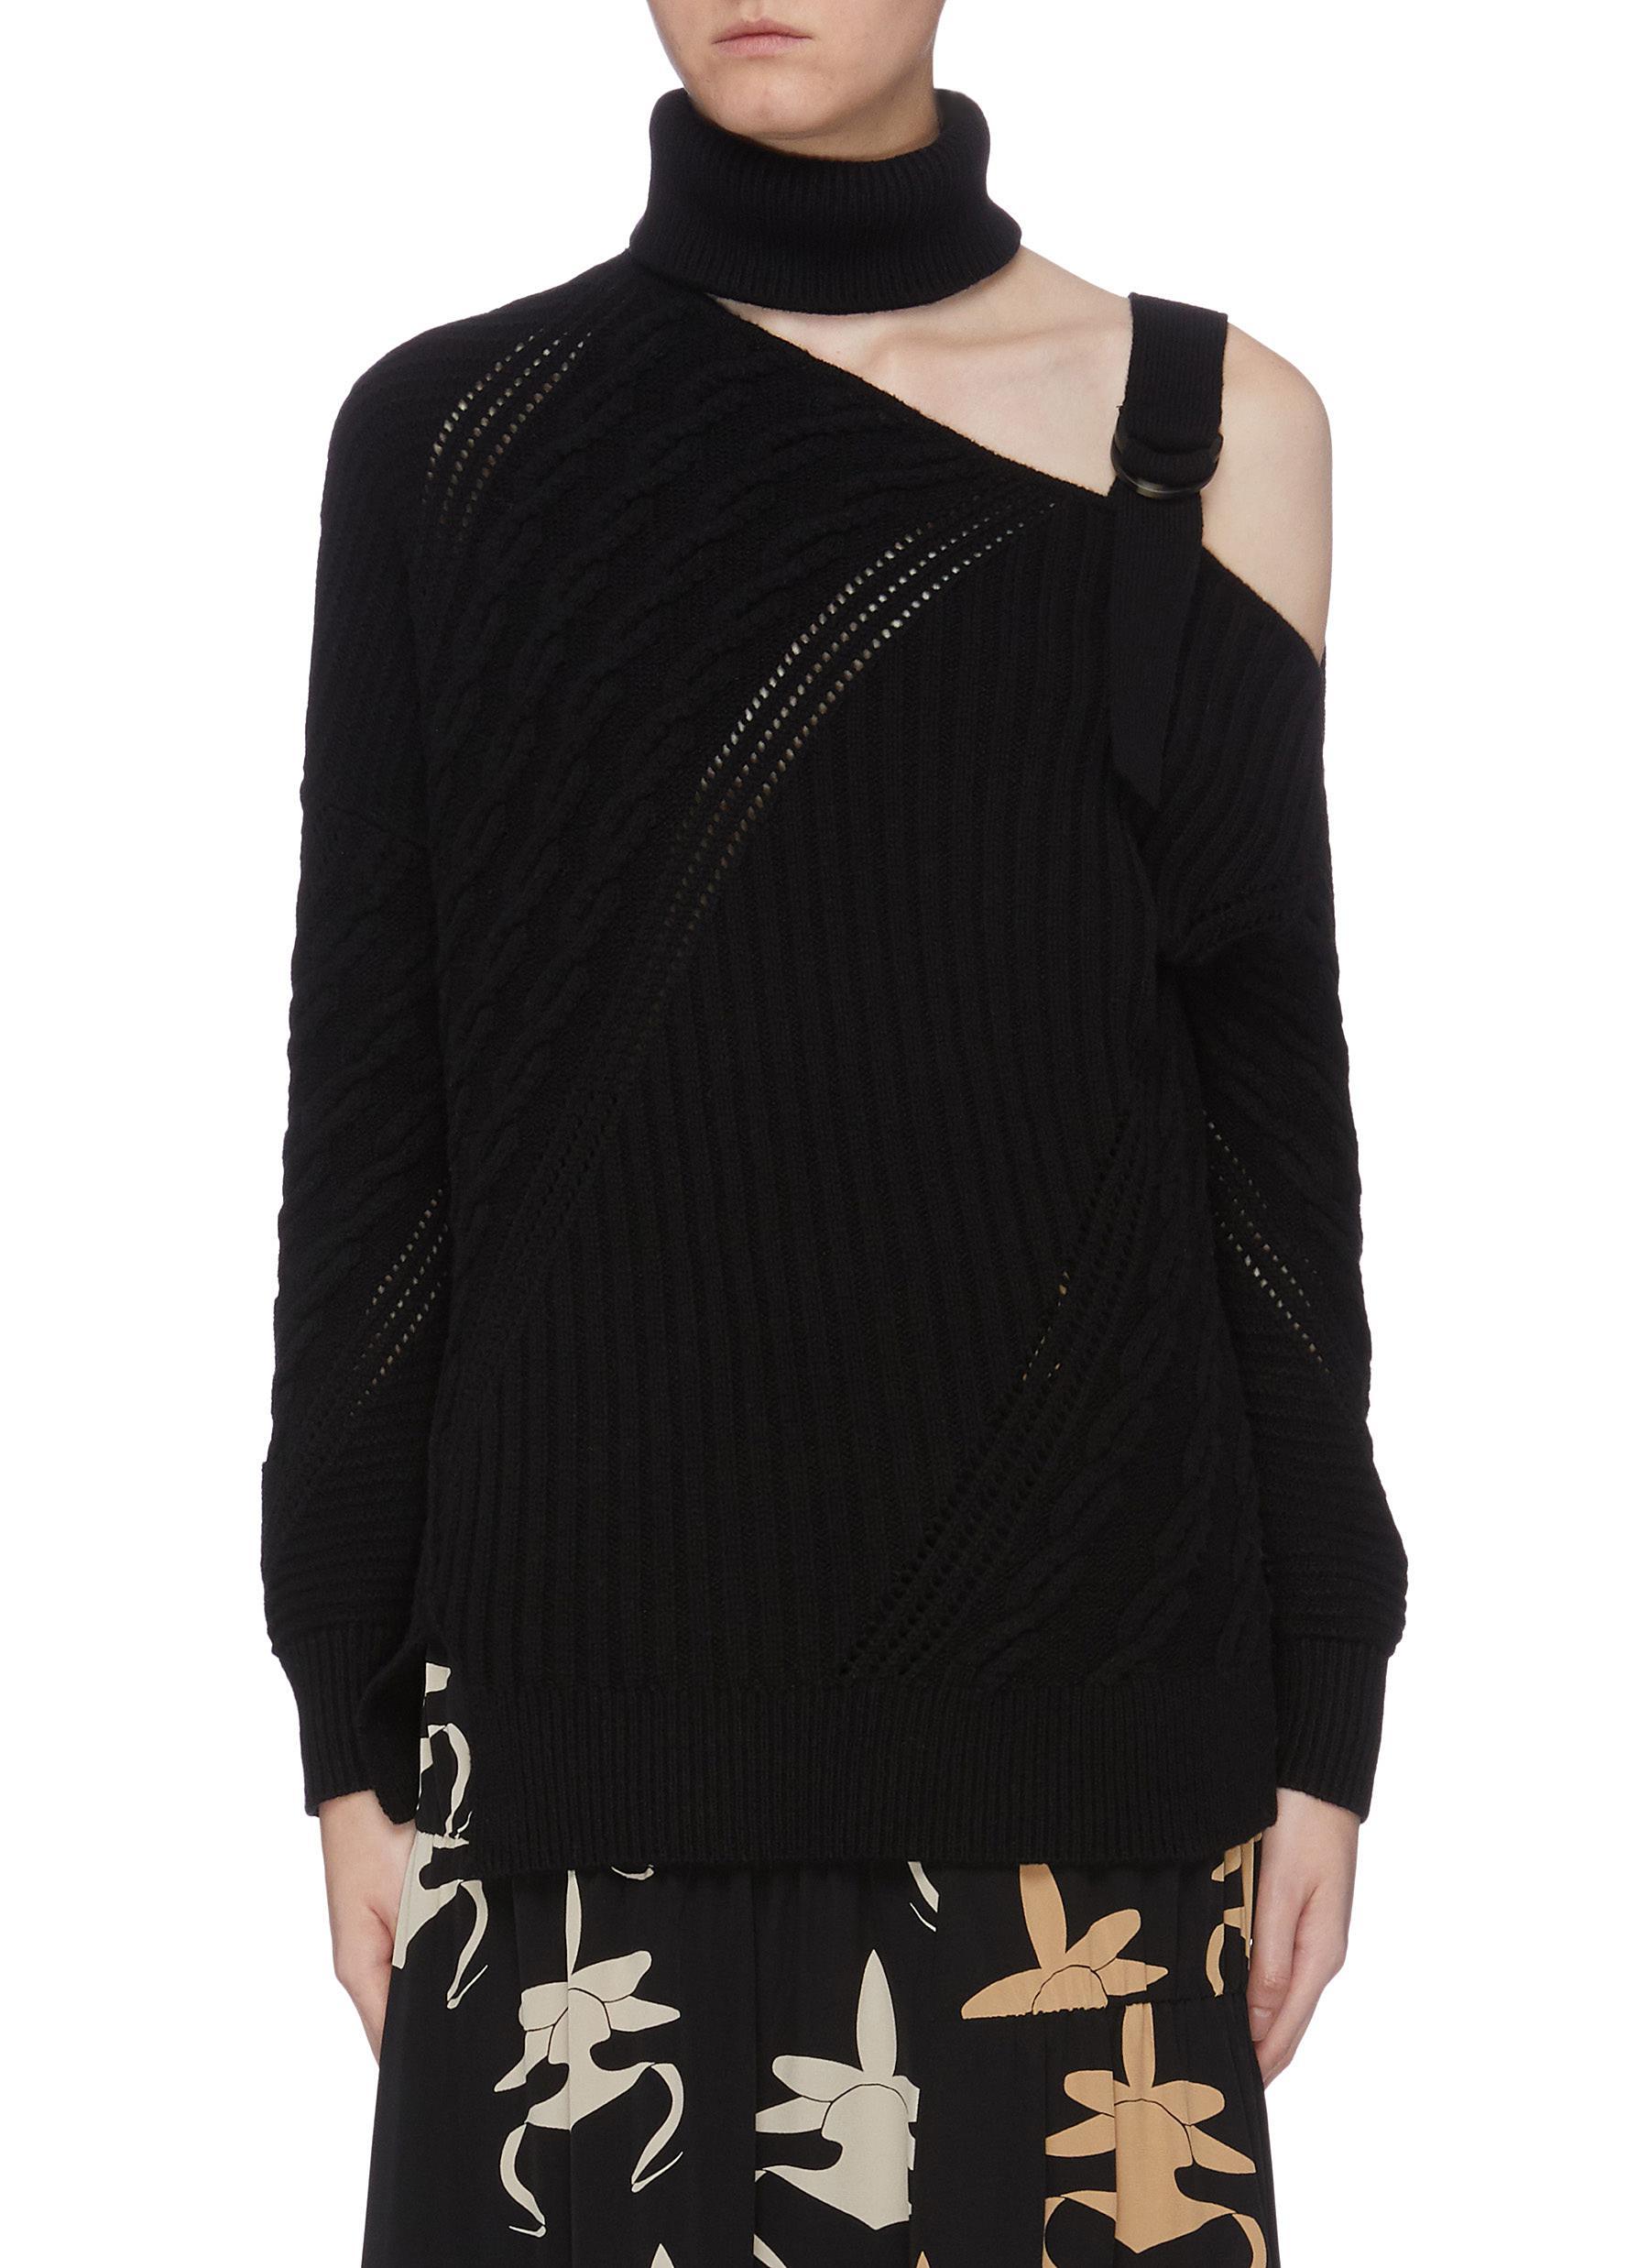 Asymmetric cold shoulder cutout turtleneck sweater by Jonathan Simkhai